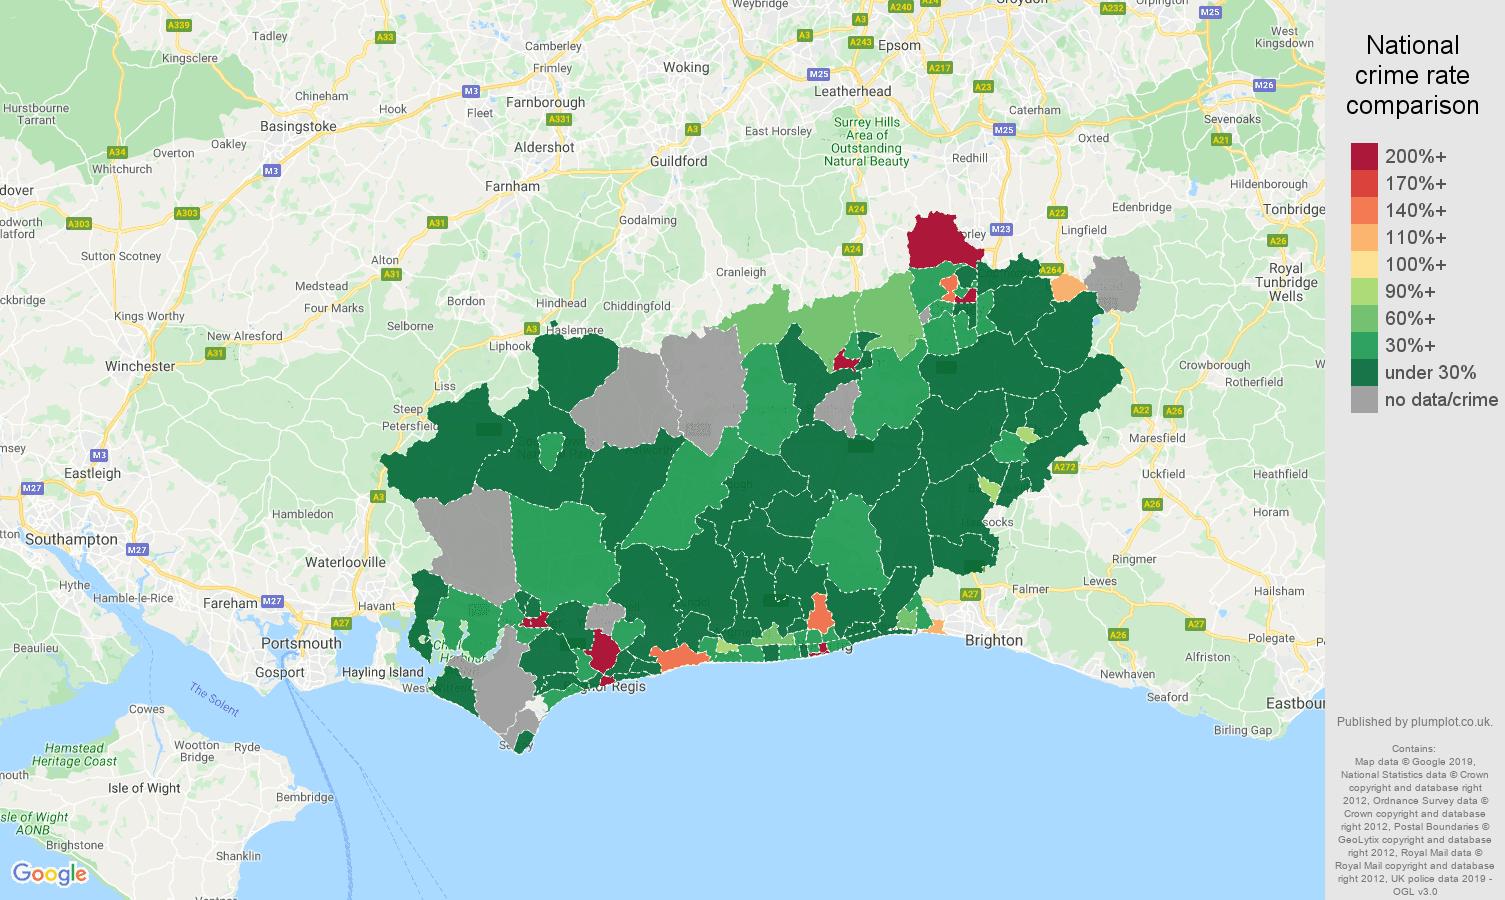 West Sussex shoplifting crime rate comparison map